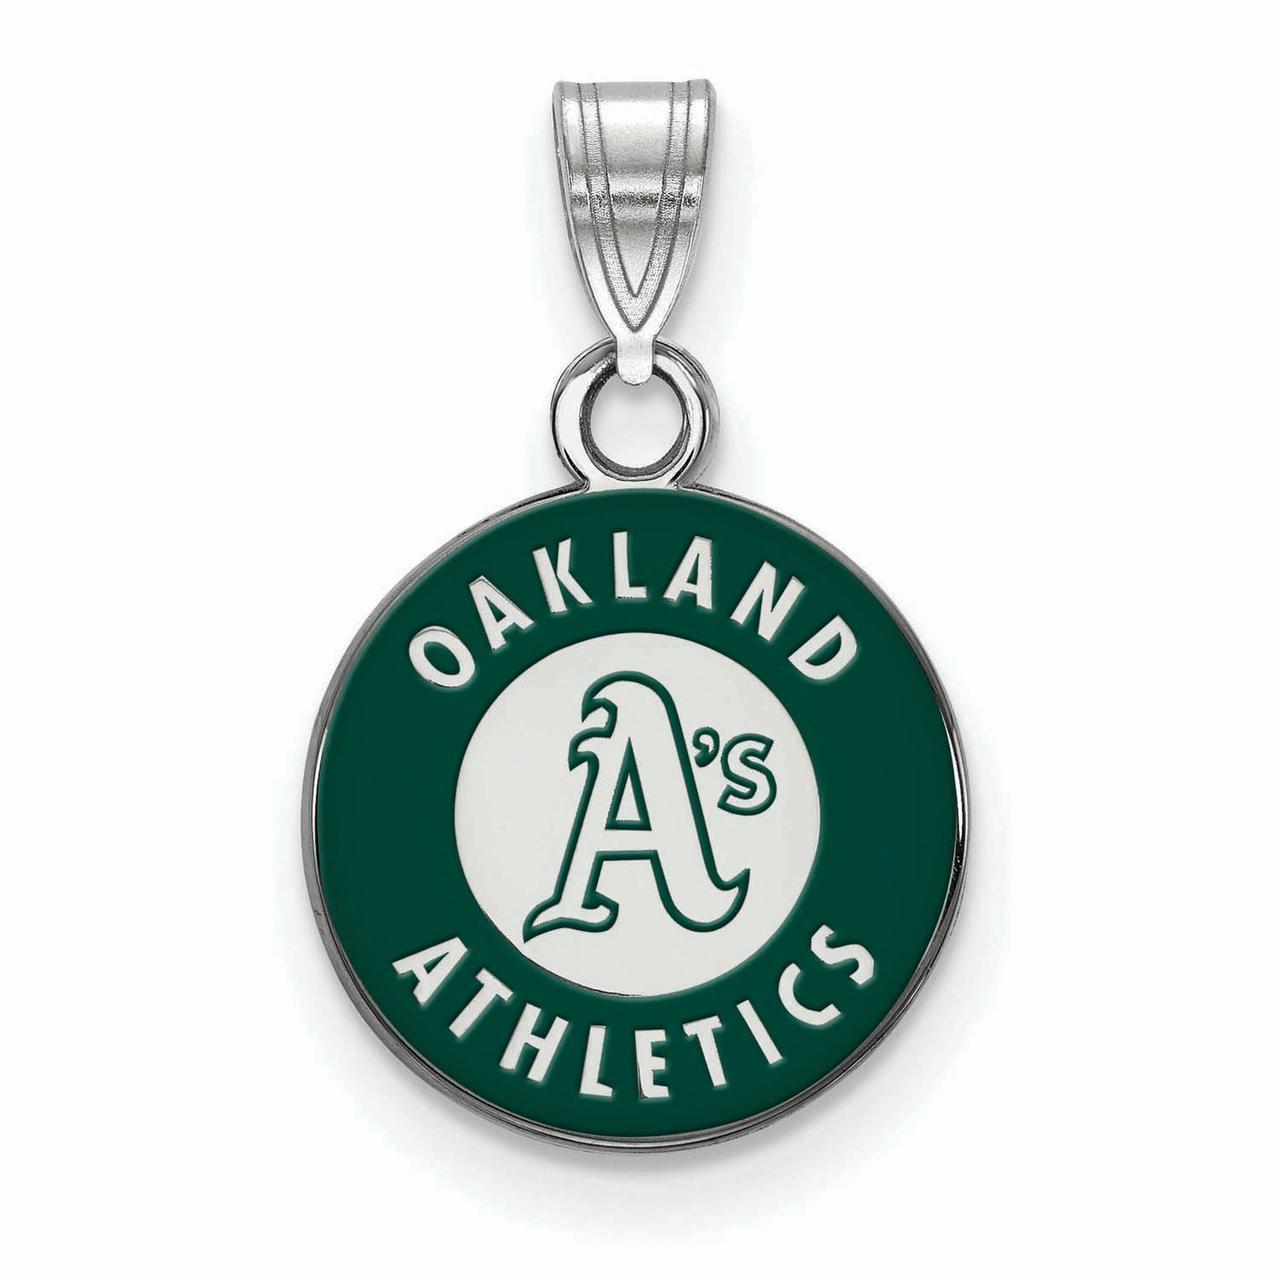 Oakland Athletics Women's Silver Enamel Pendant - No Size